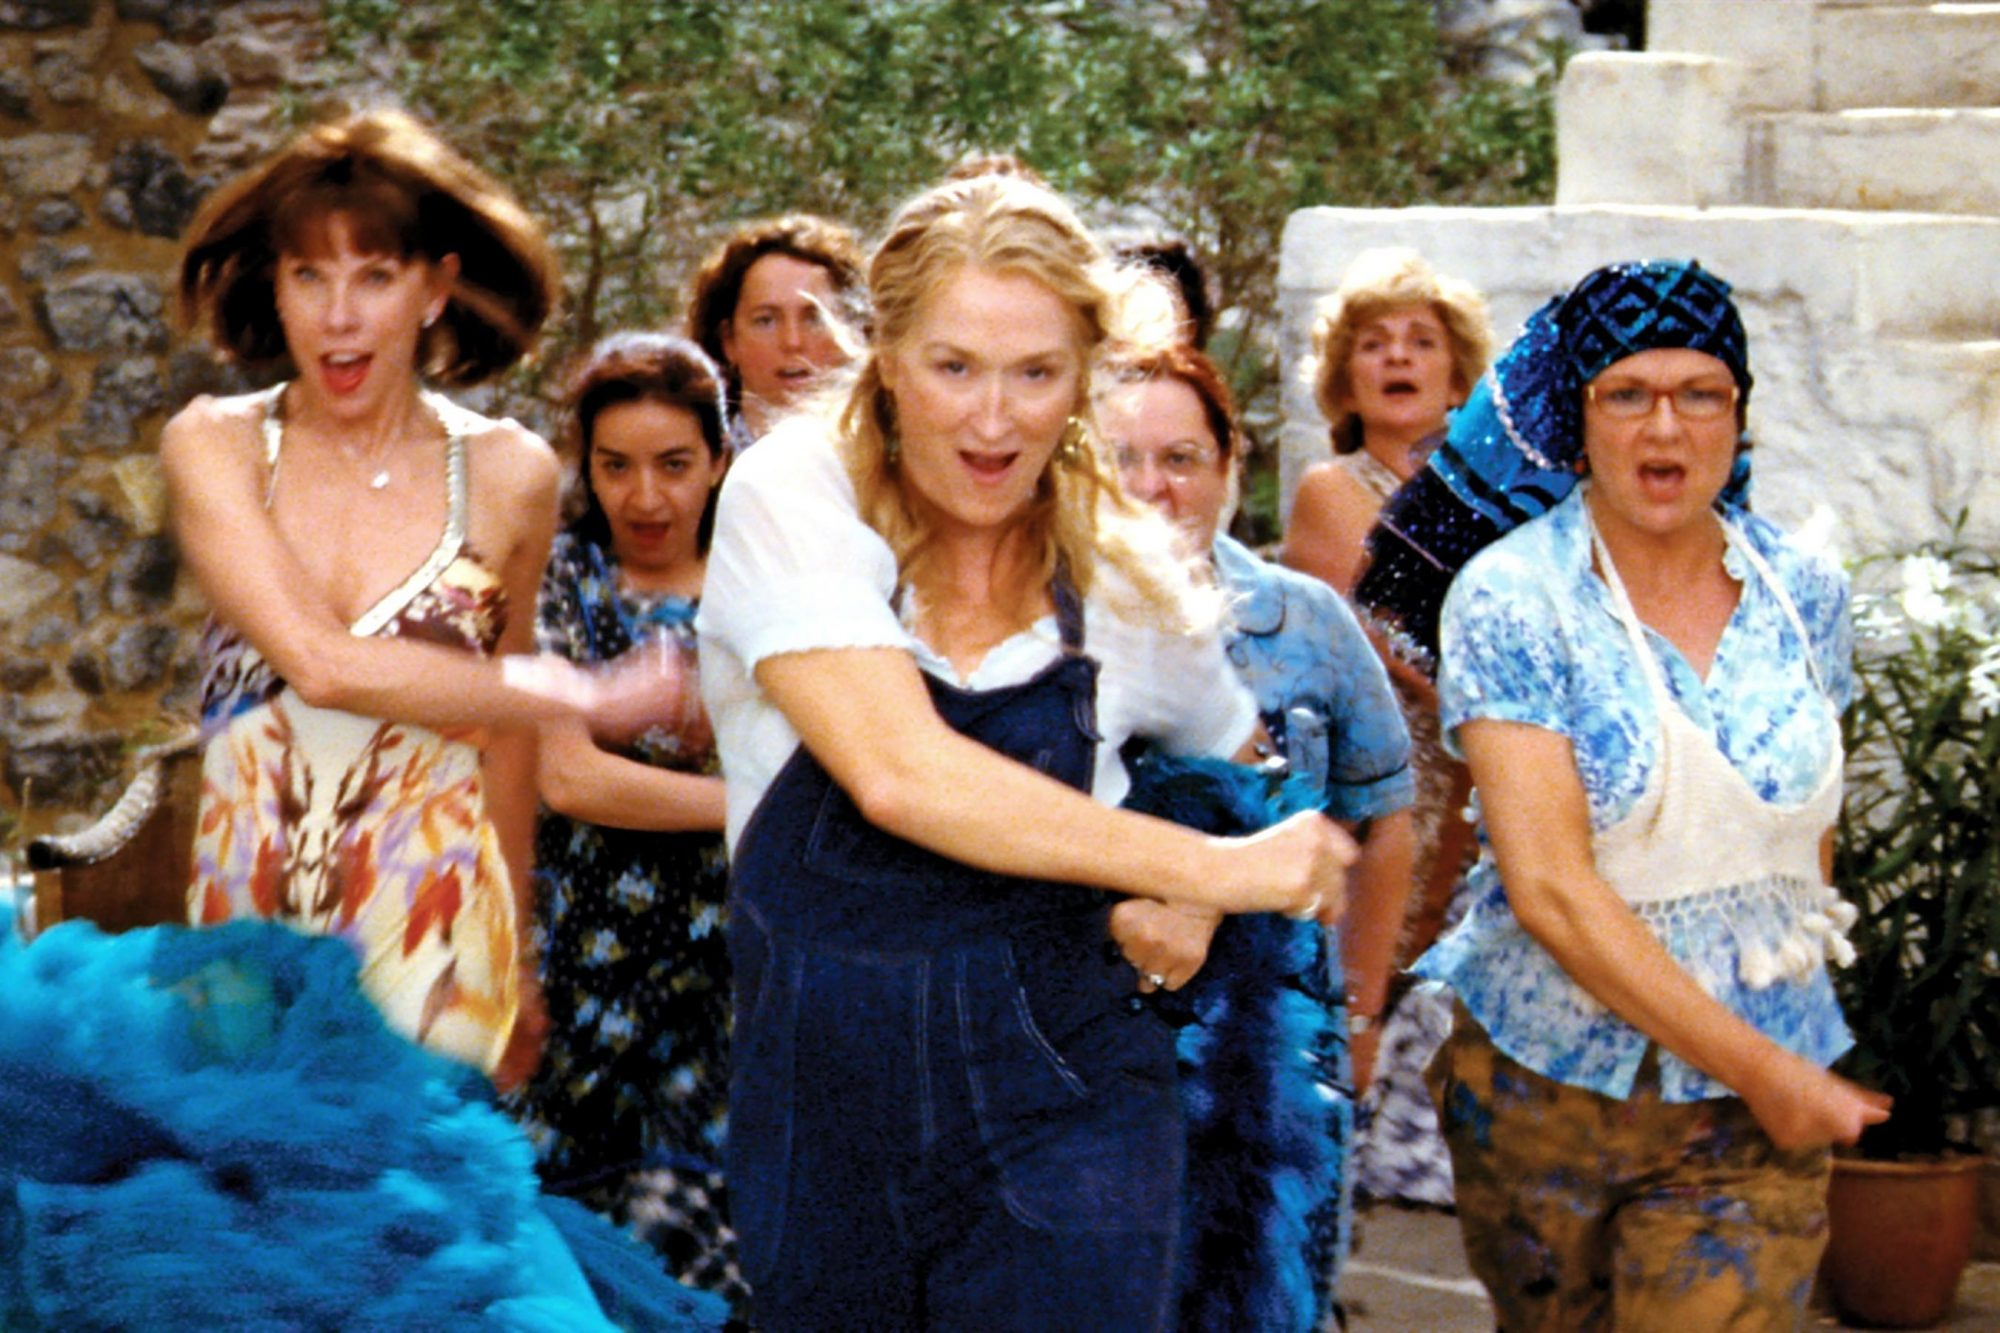 MAMMA MIA!, front, from left: Christine Baranski, Meryl Streep,  Julie Walters, 2008. ©Universal/cou